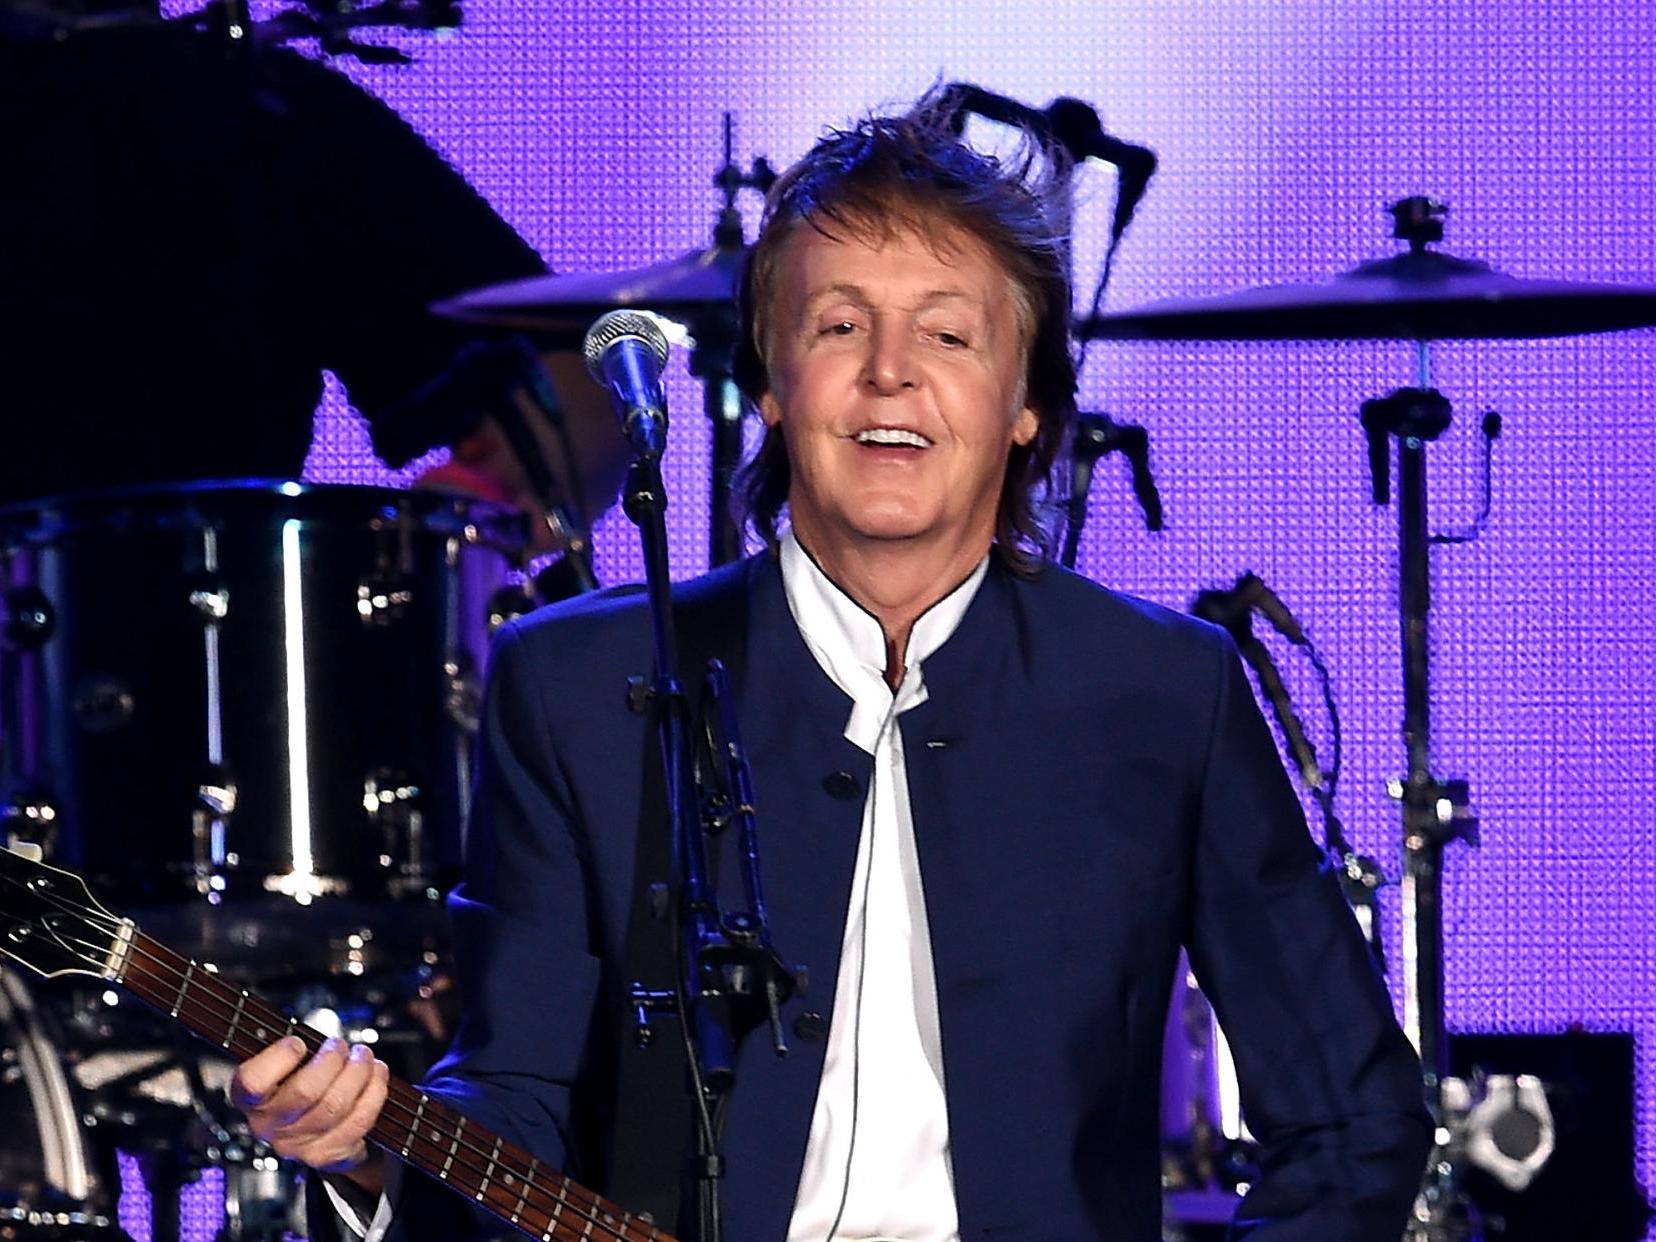 Glastonbury 2020: Paul McCartney responds to rumours of headline slot at festival